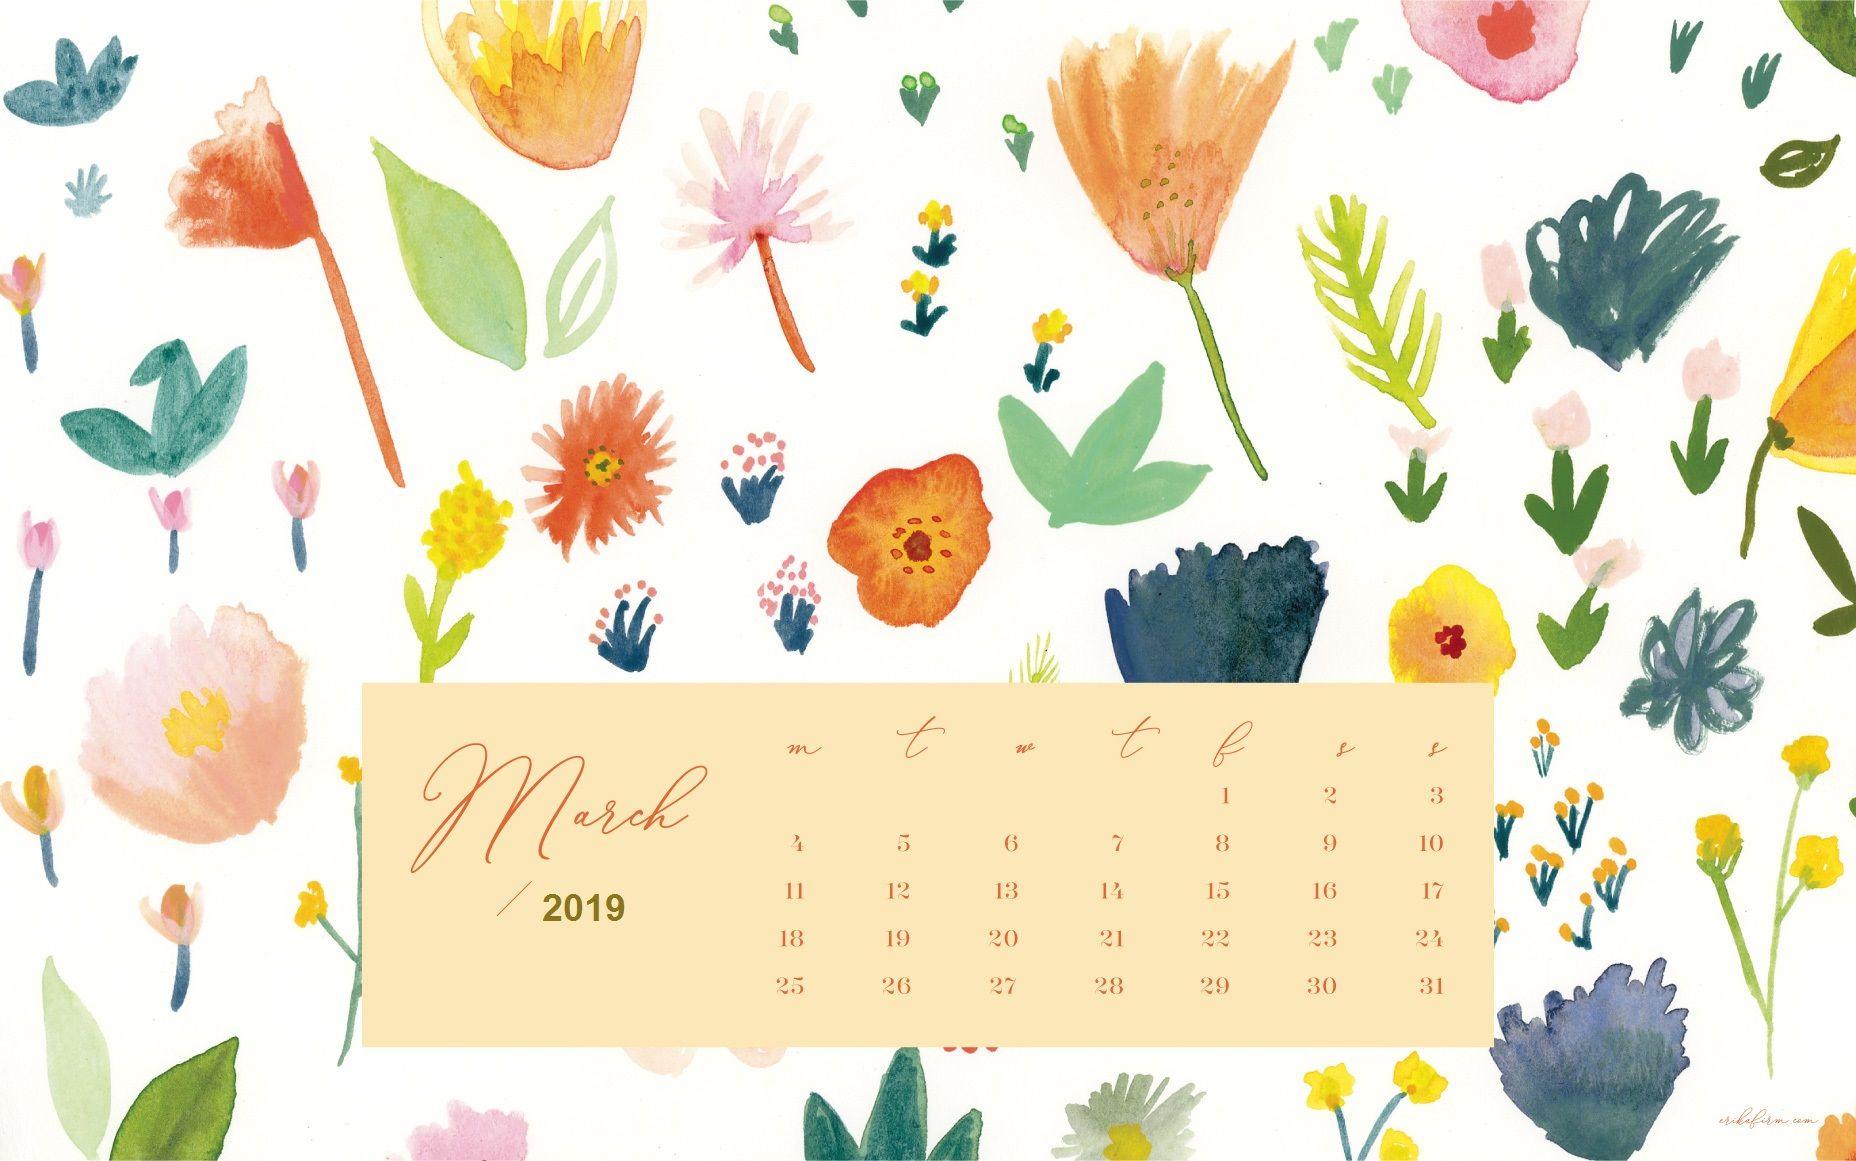 March 2019 Calendar Floral Background Calendar Wallpaper Desktop Wallpaper Calendar Floral Wallpaper